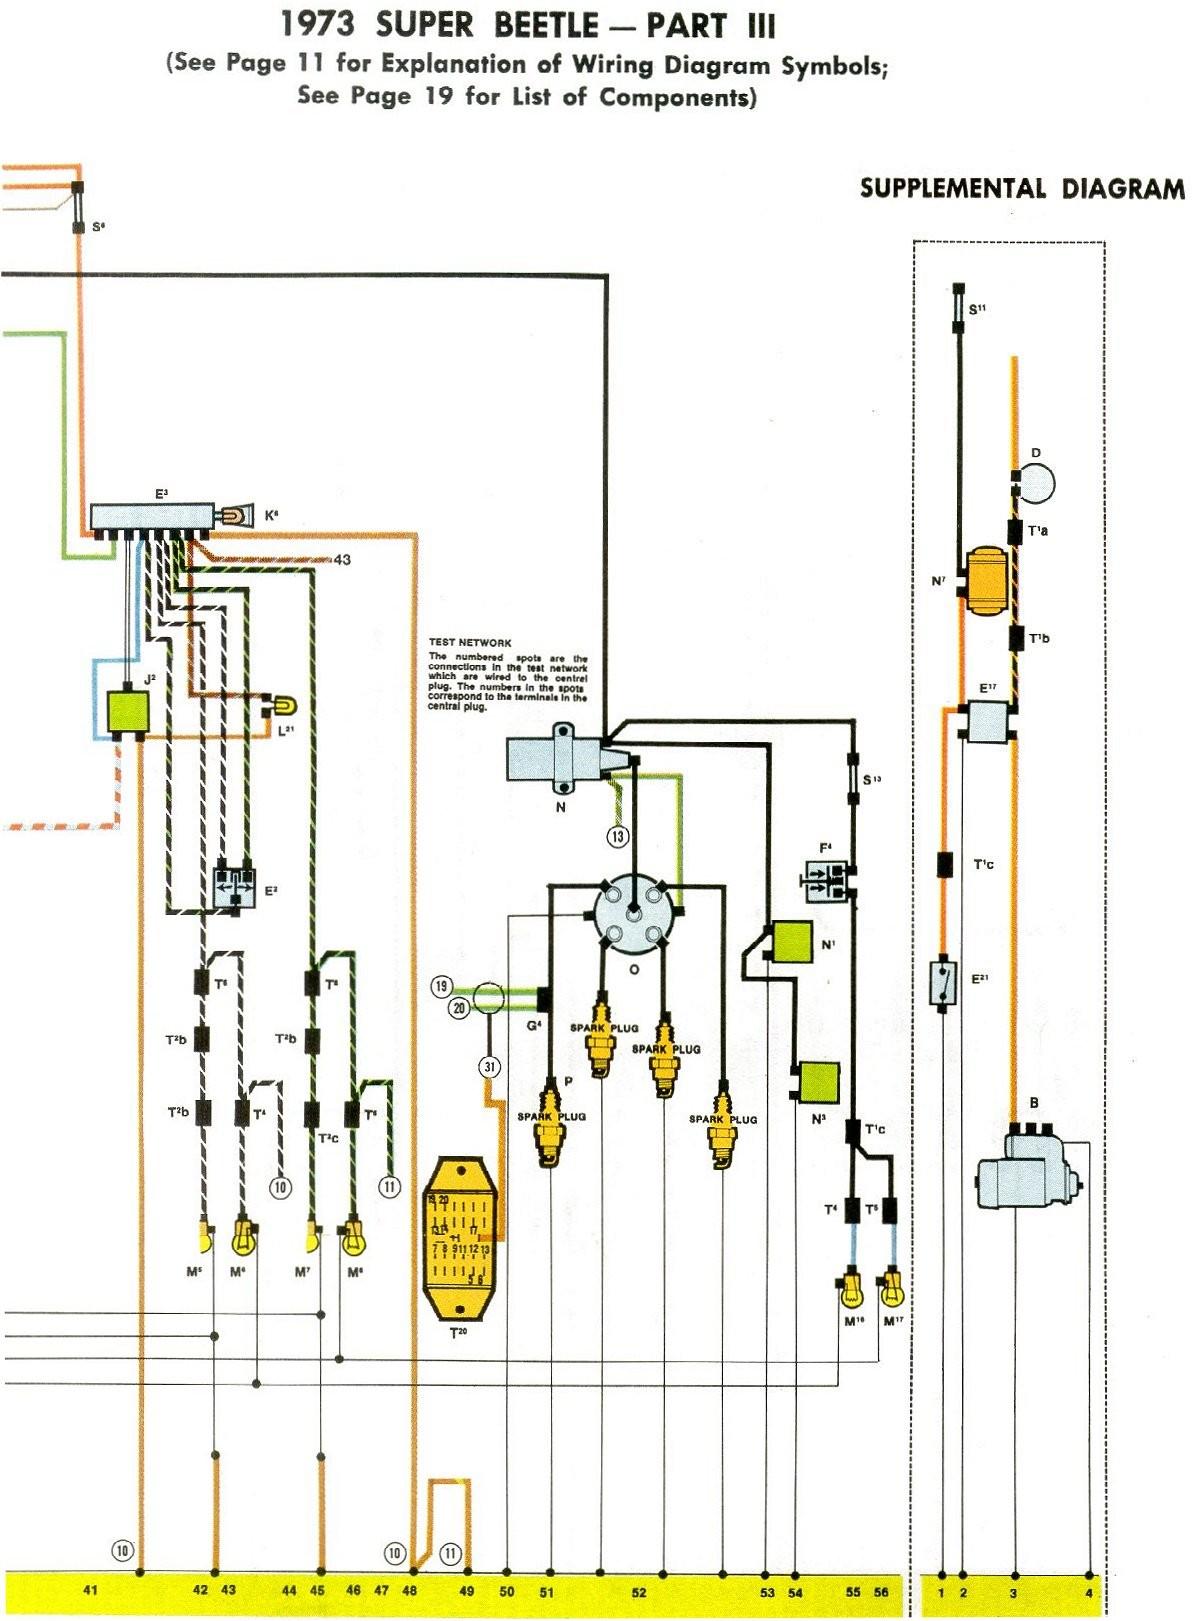 vw beetle starter wiring diagram wiring diagram image vw starter solenoid wire 1973 vw super beetle wiring diagram